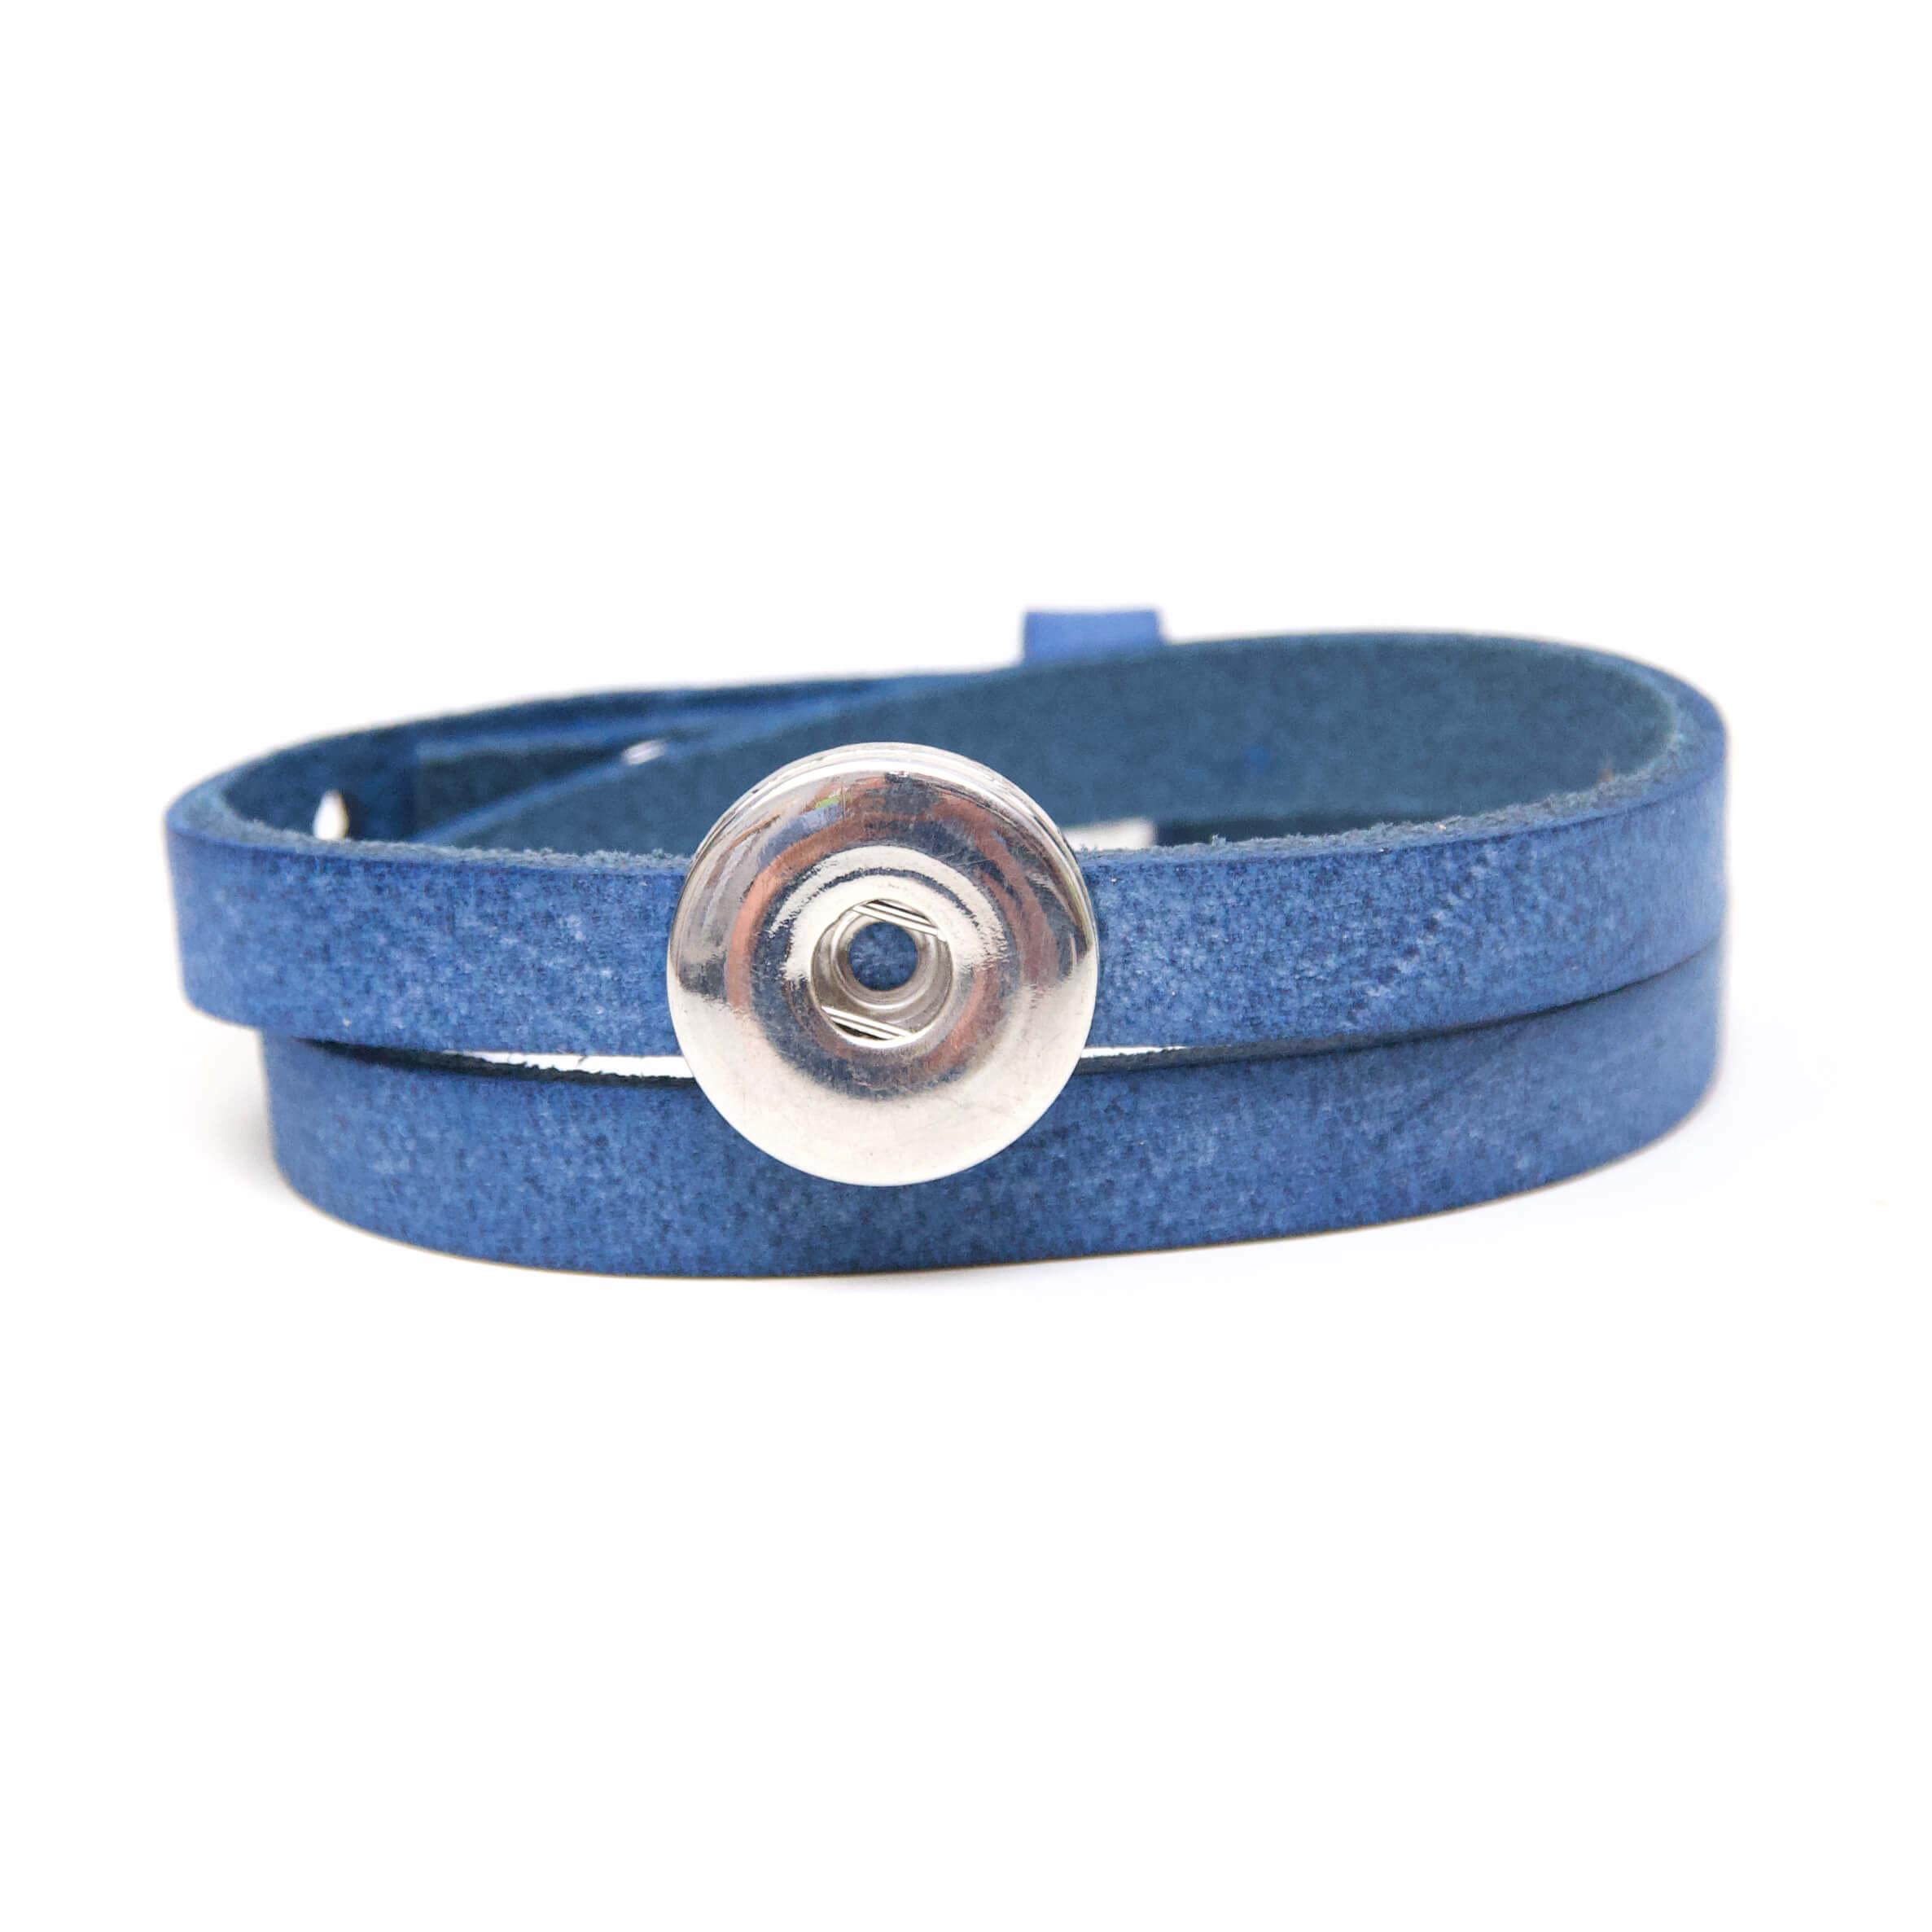 Druckknopf Lederarmband in königsblau für 16mm Druckknöpfe